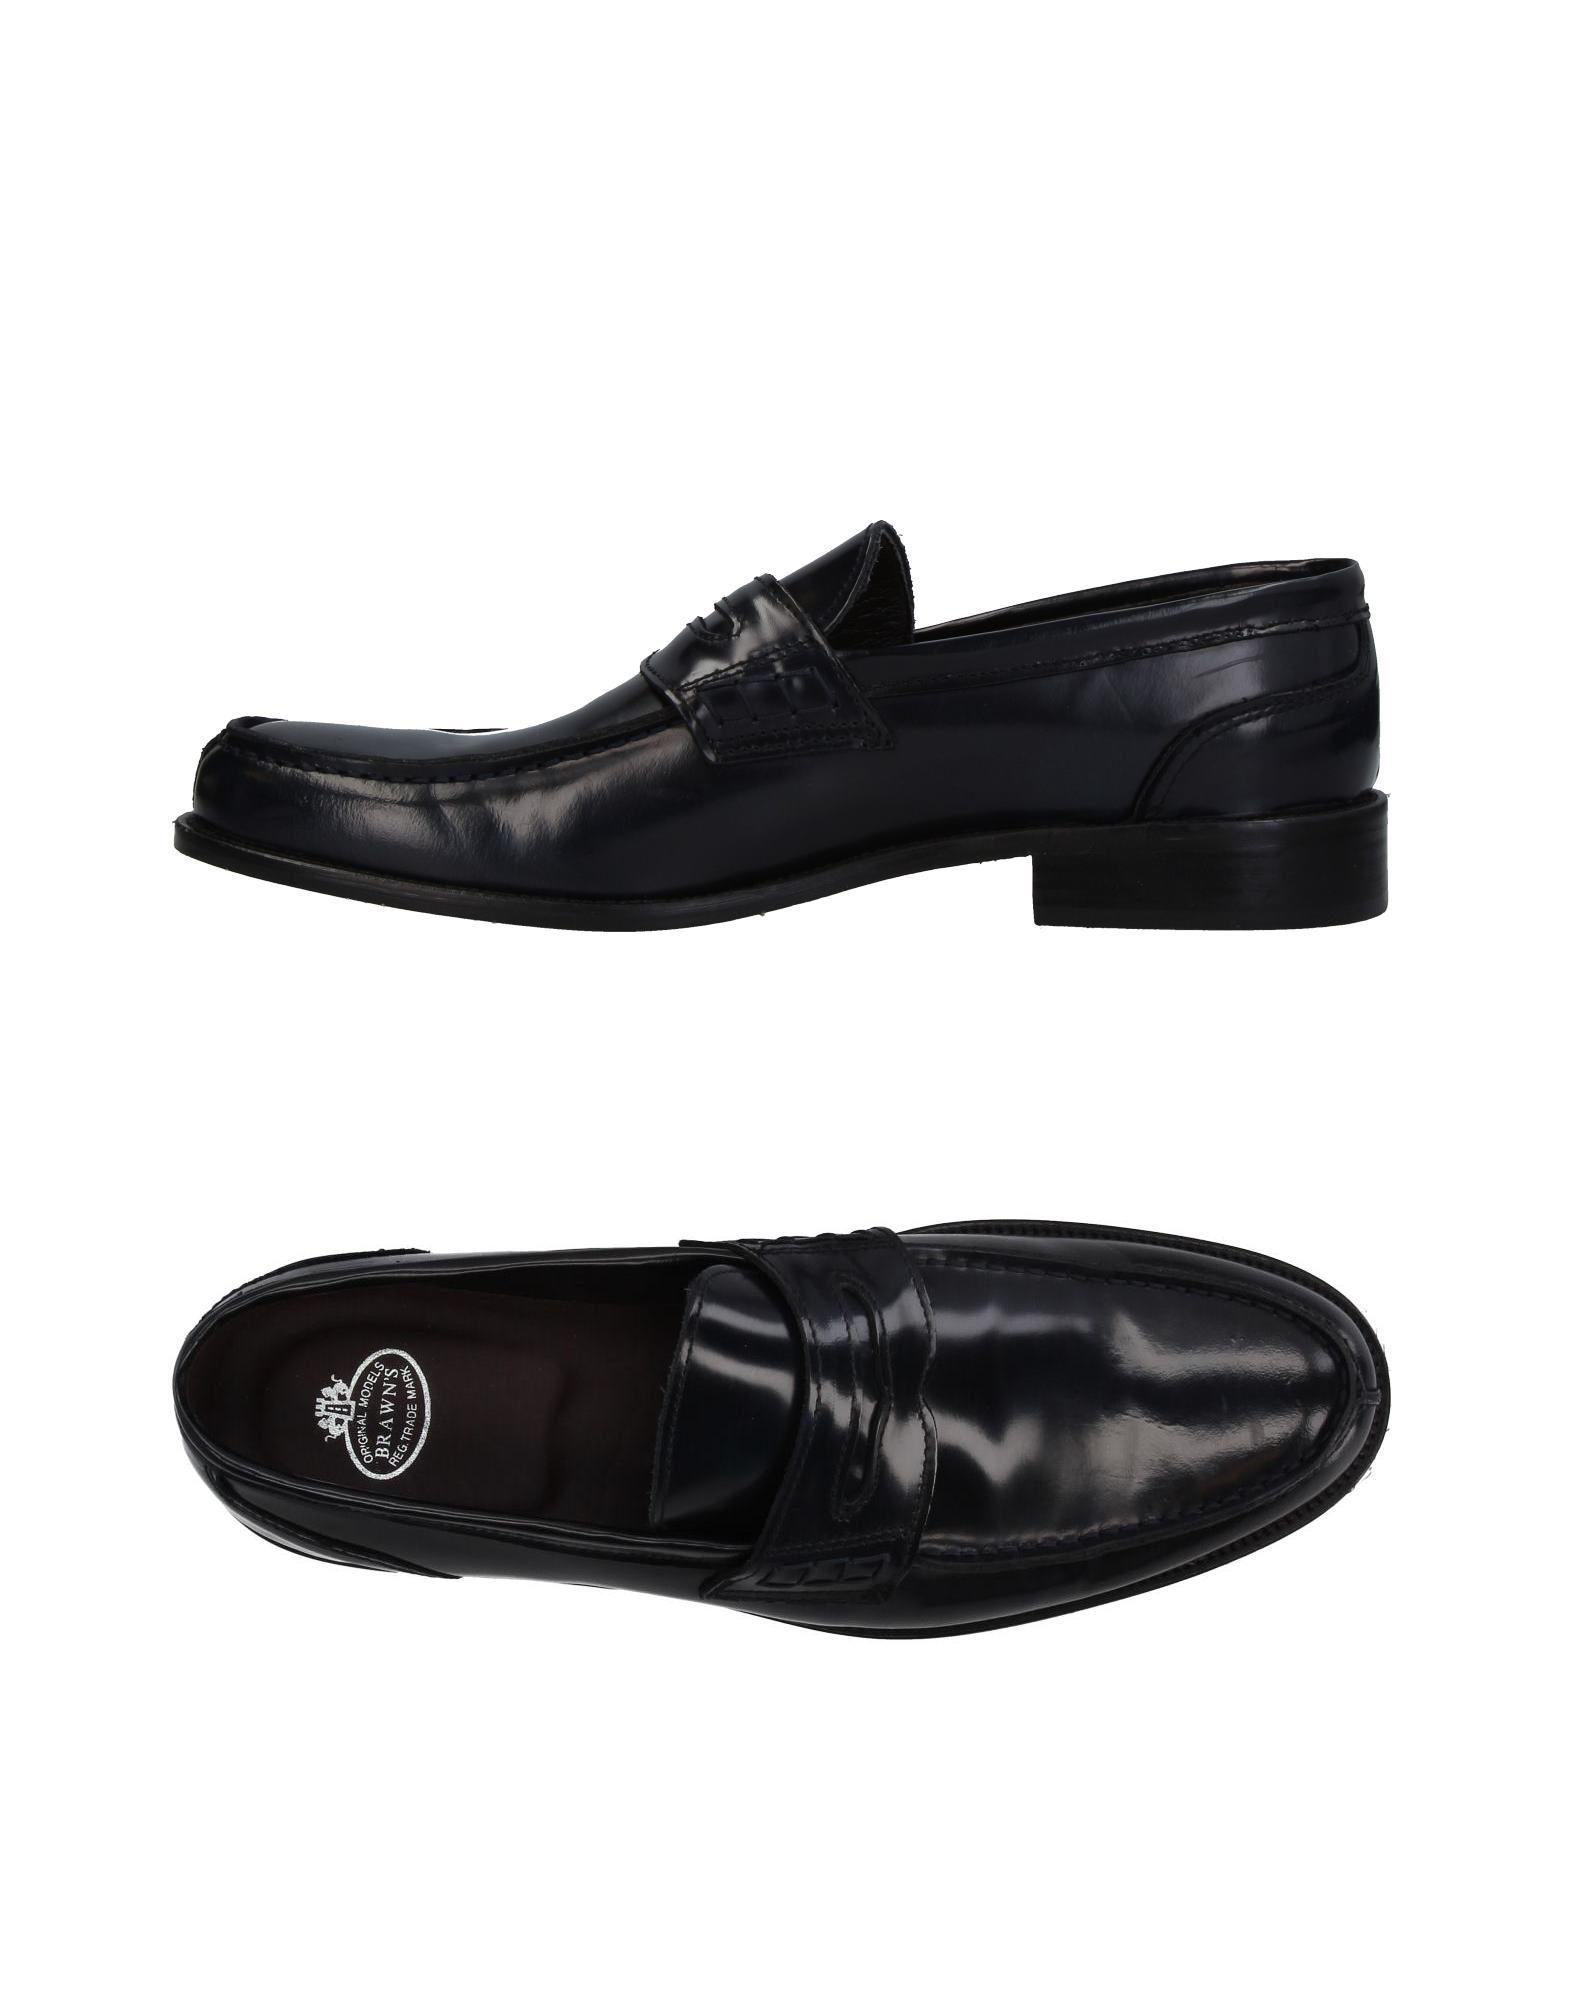 Rabatt echte Schuhe Brawn's Mokassins Herren  11411251LV